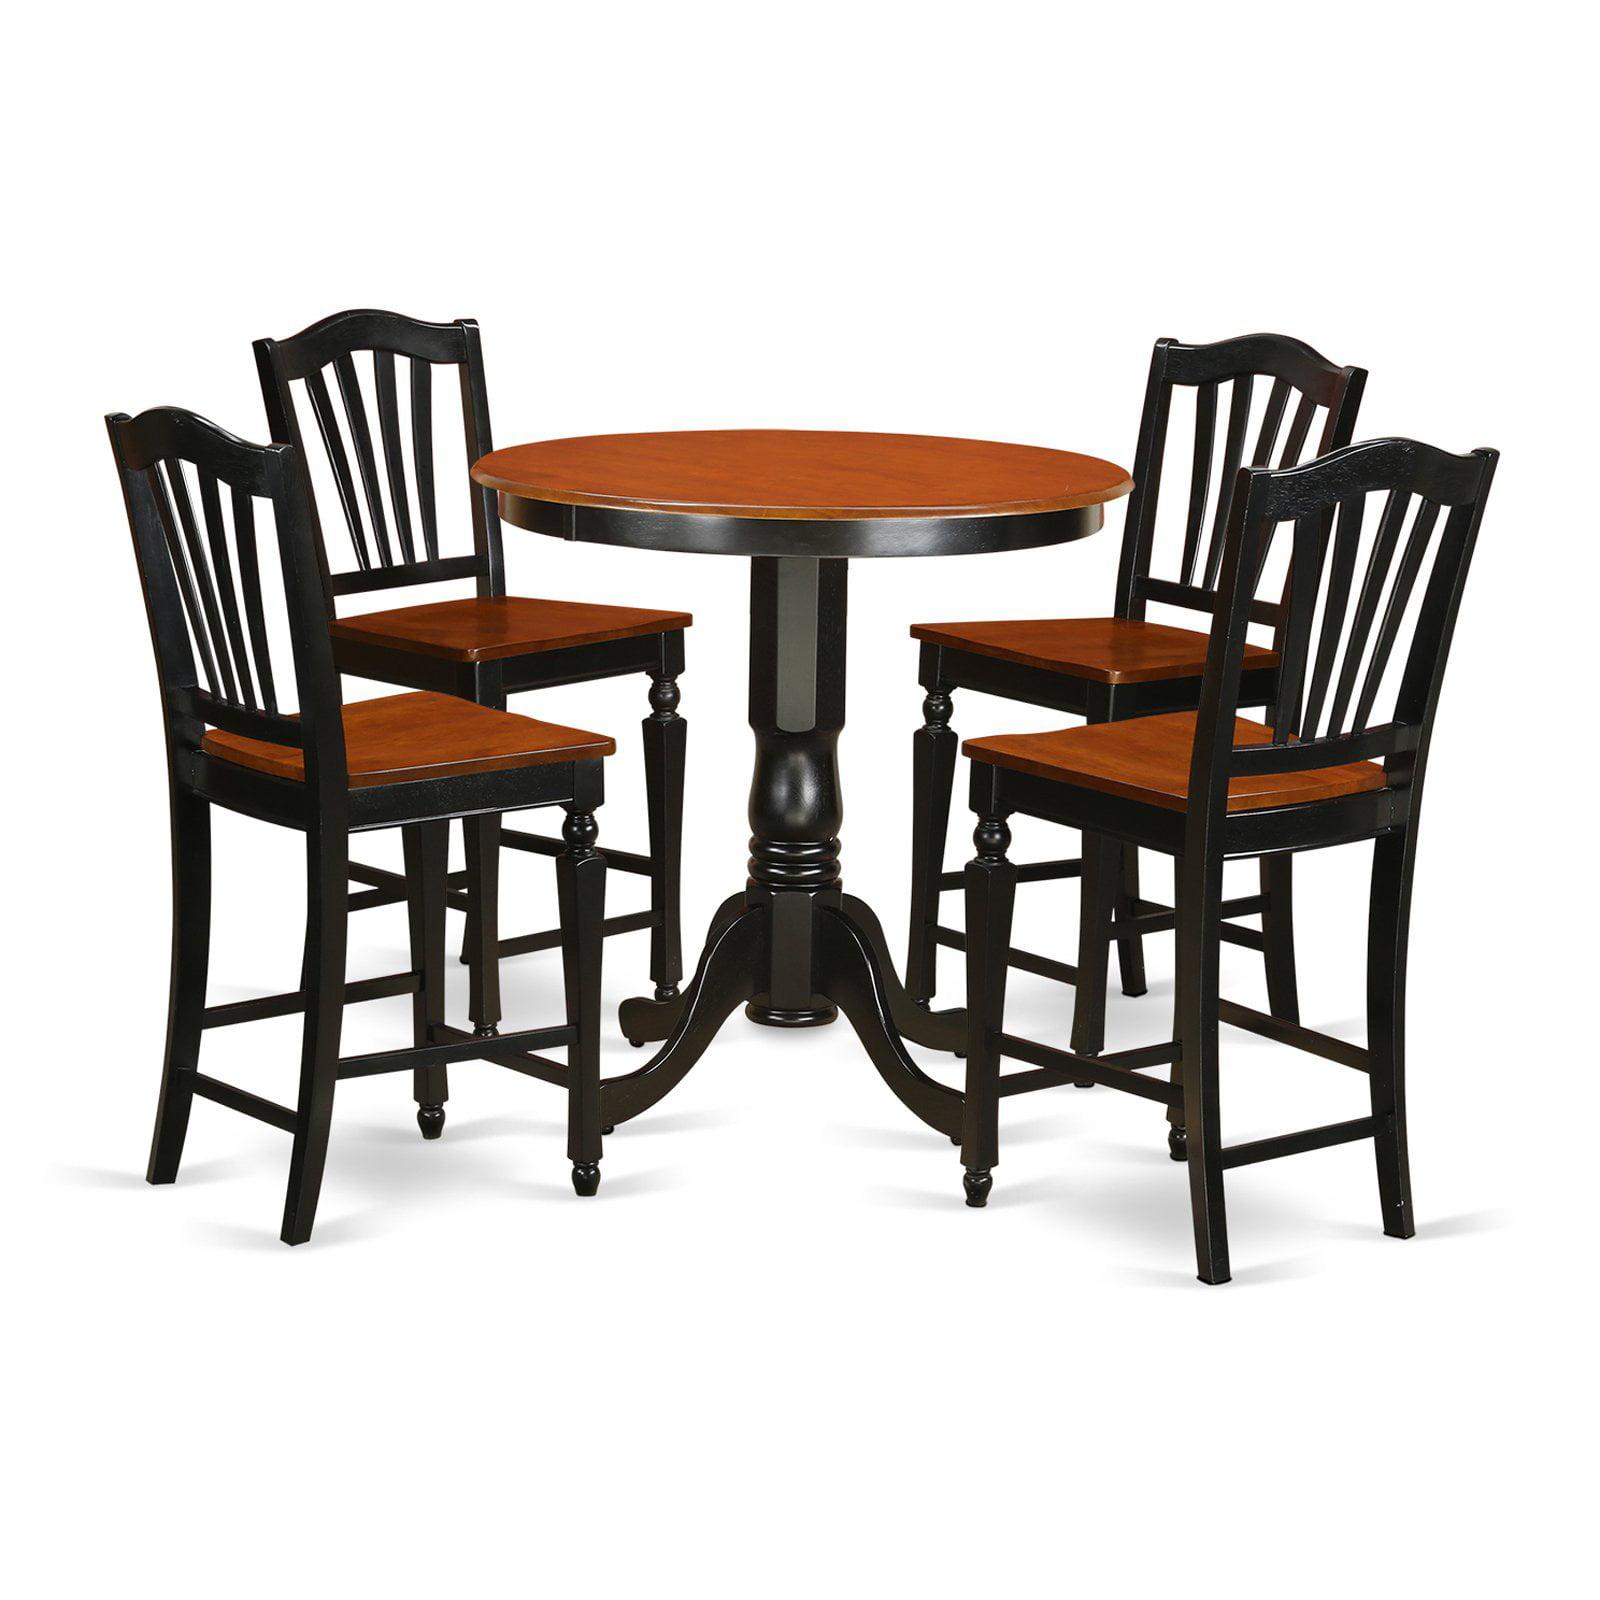 East West Furniture Jackson 5 Piece High Splat Dining Table Set